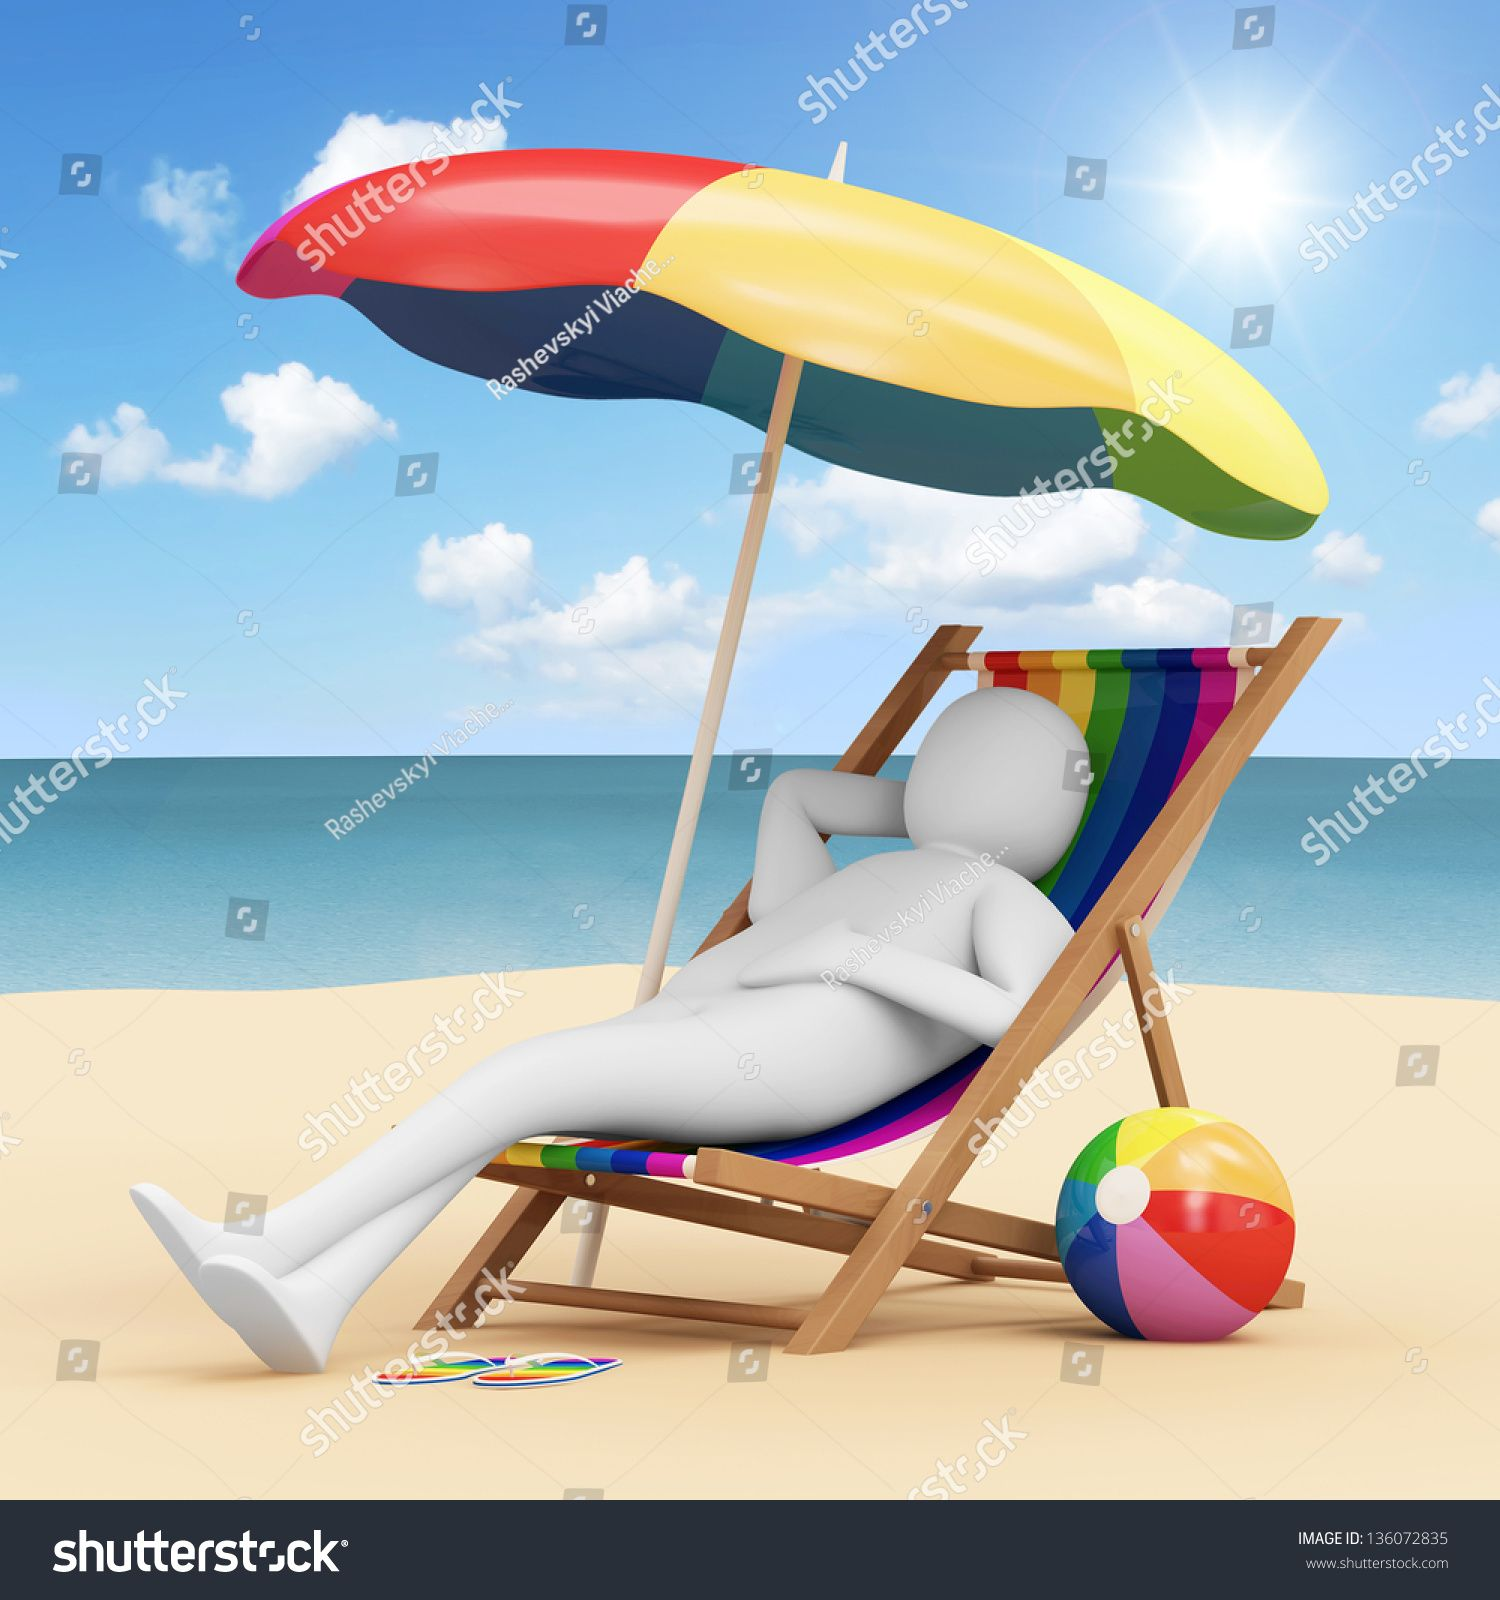 Man In Beach Chair 3d Man Lying On Beach Chair Stock Illustration 136072835 Shutterstock Lying On Beach Beach Chairs 3d Man